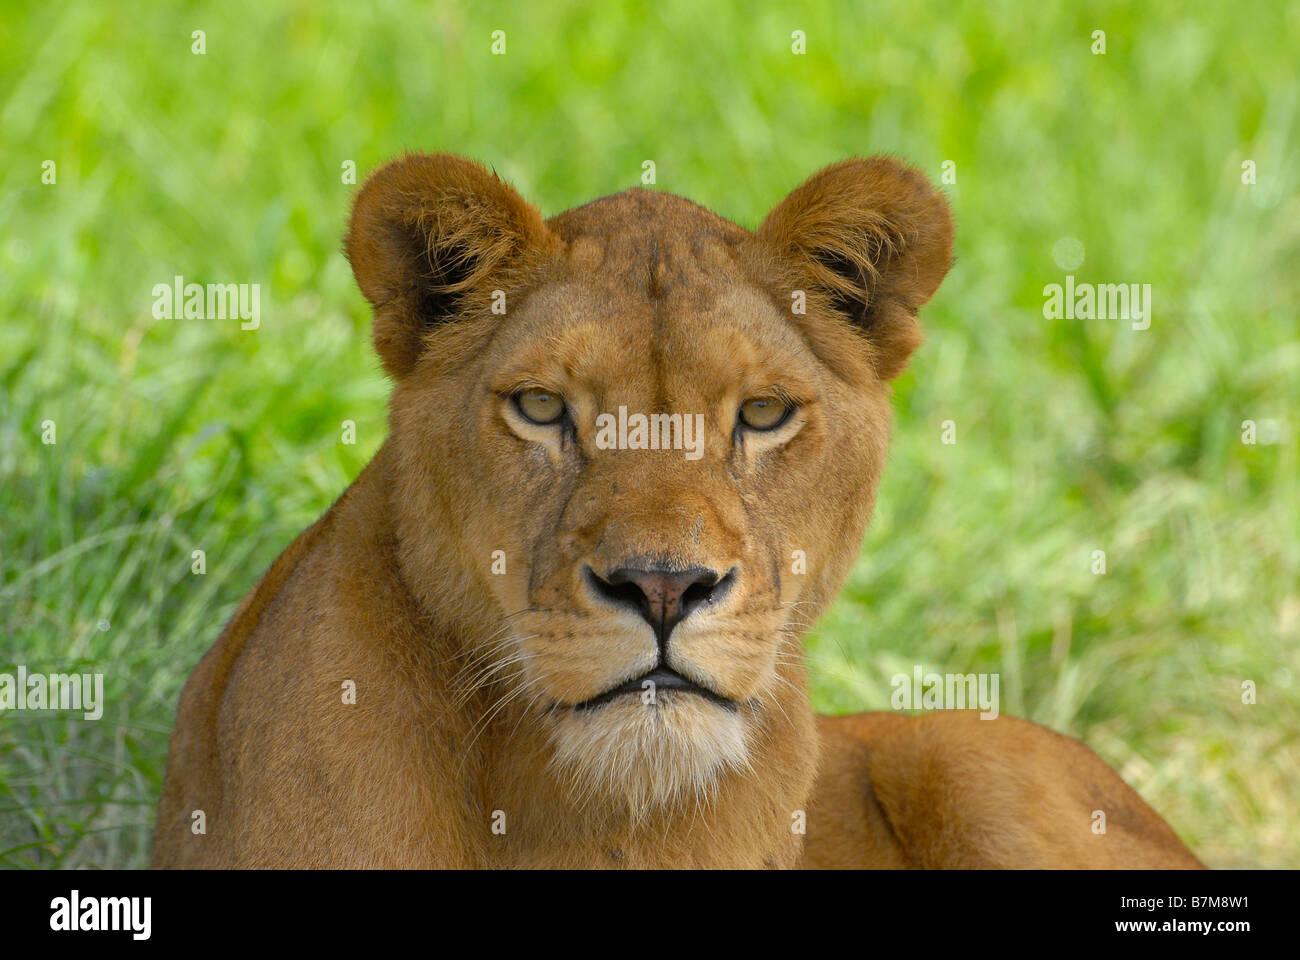 Leonessa in Natal Lion Park vicino a Pietermaritzburg, capitale di Kwazulu Natal Provincia del Sud Africa Immagini Stock